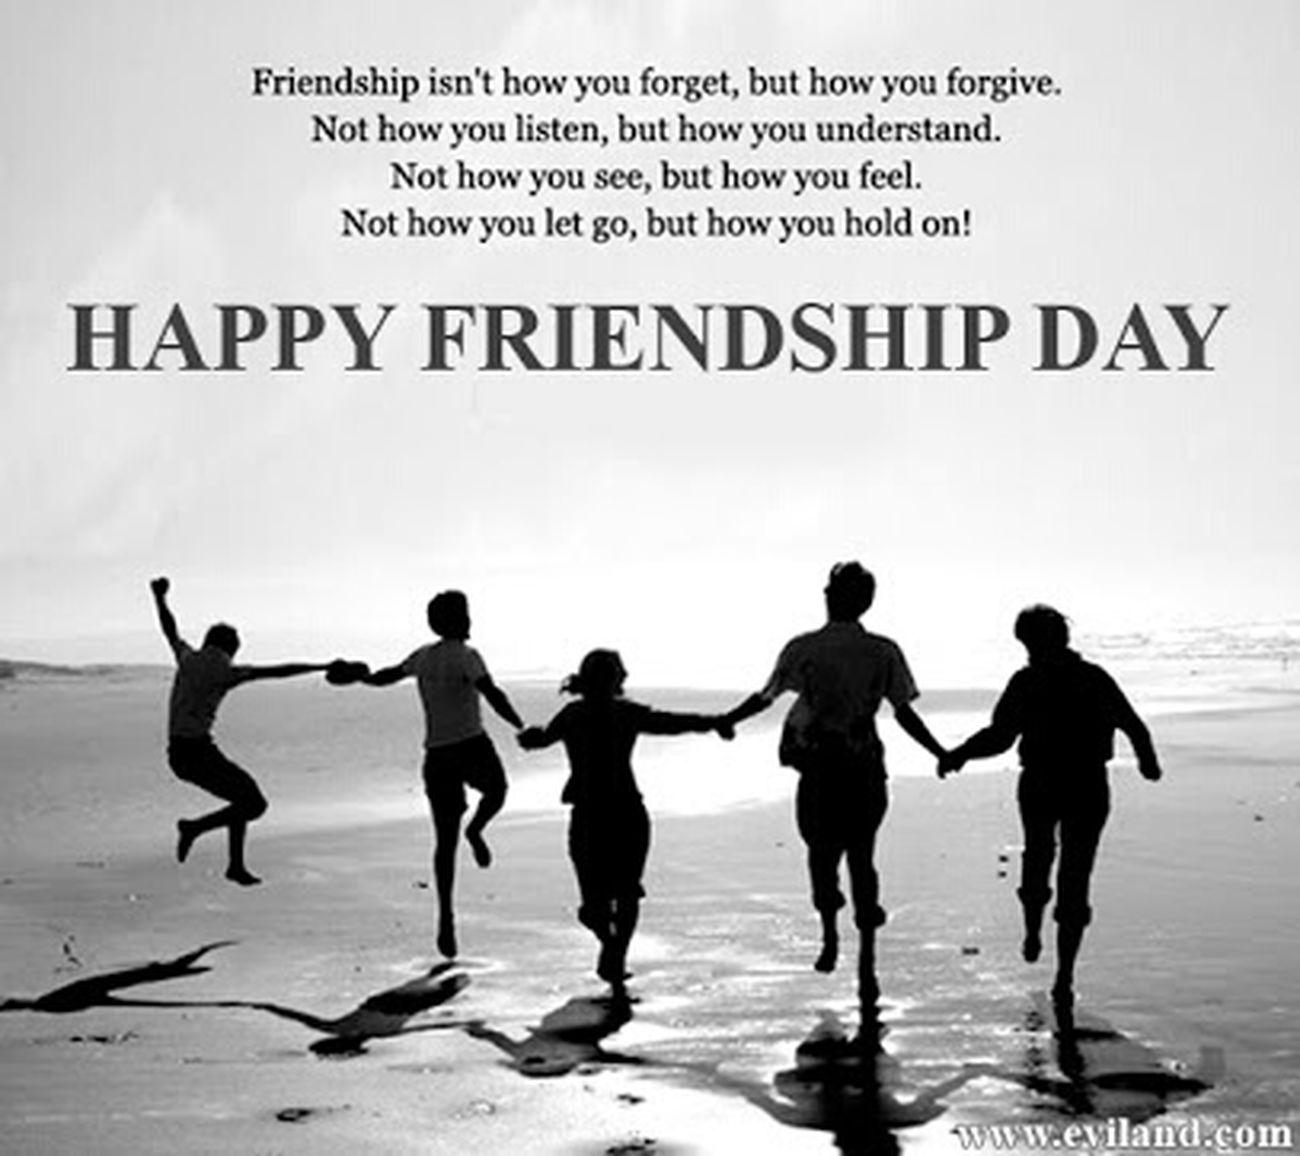 Friendship Day HappyFriendshipDay HappyFriendshipDayWeek Realfriendshipdoesntfinish Love ♥ Friends Qoutes & Sayings Friend!❤